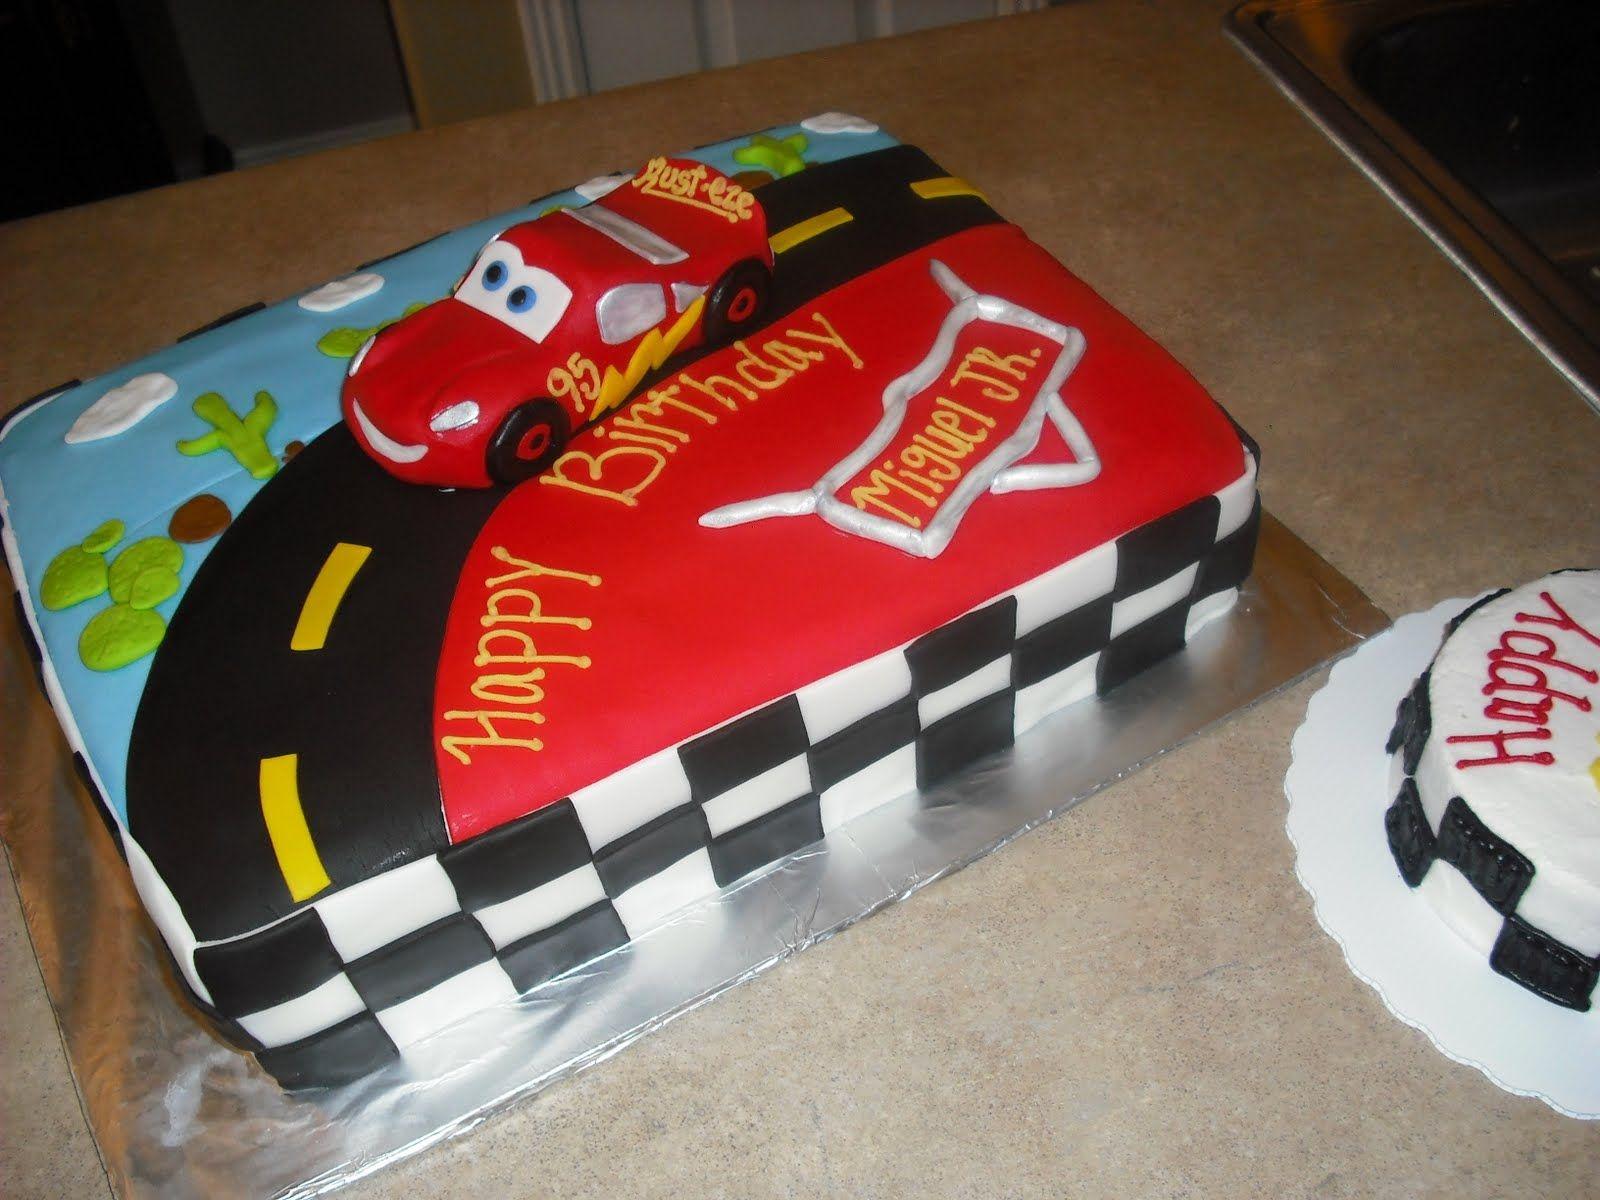 Birthday Cake Ideas With Cars : http://3.bp.blogspot.com/_1cQwGR6YY5o/TB0xGccO6vI ...